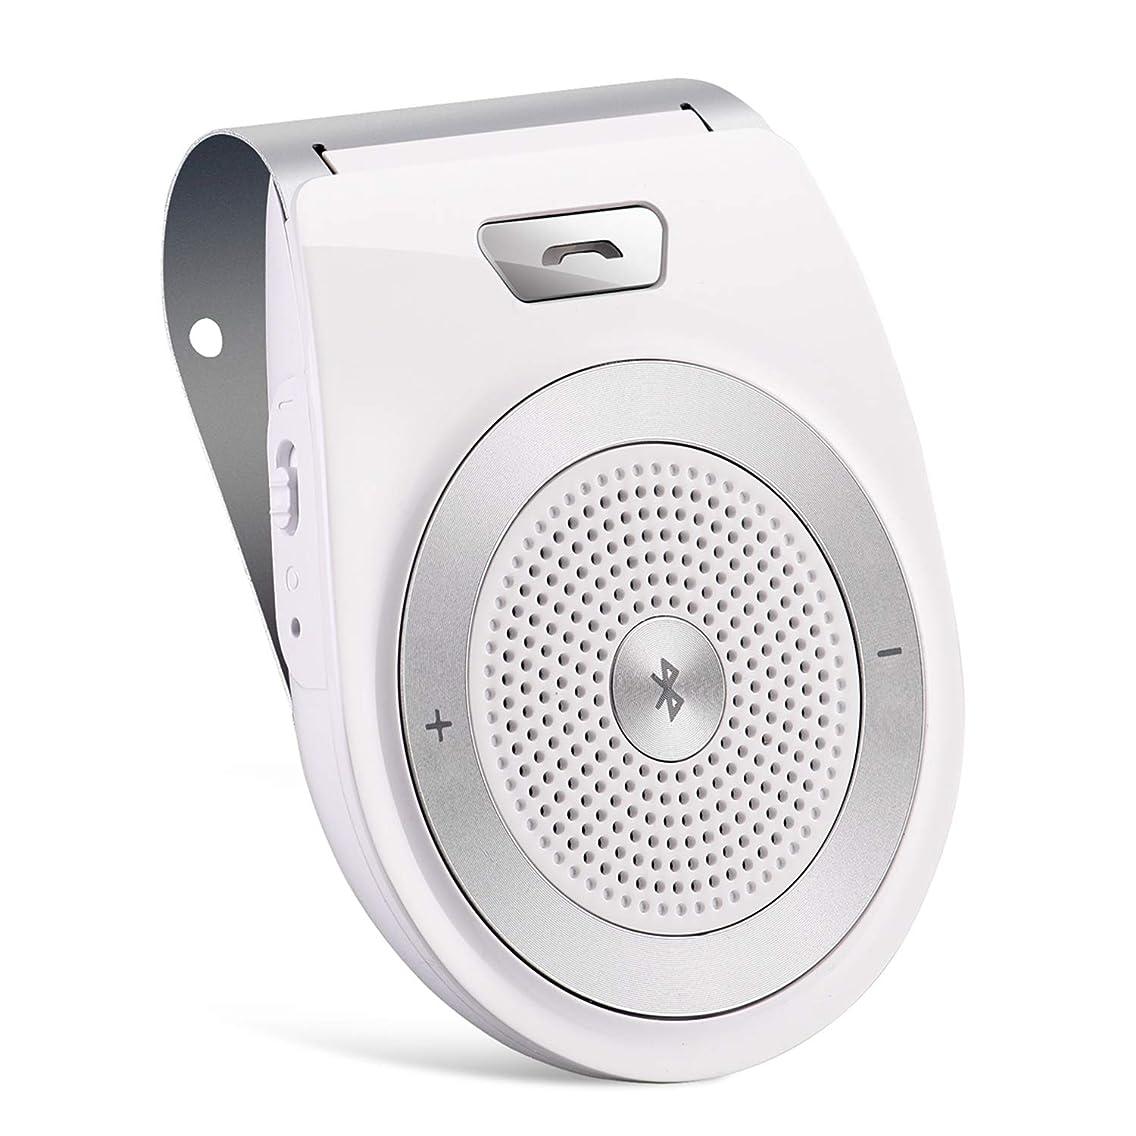 Wireless HandsFree Car Speakerphone,TIANSHILI Visor Clip Bluetooth Speaker,Auto On Off,Dual Link Connectivity with Siri & Google Assistant